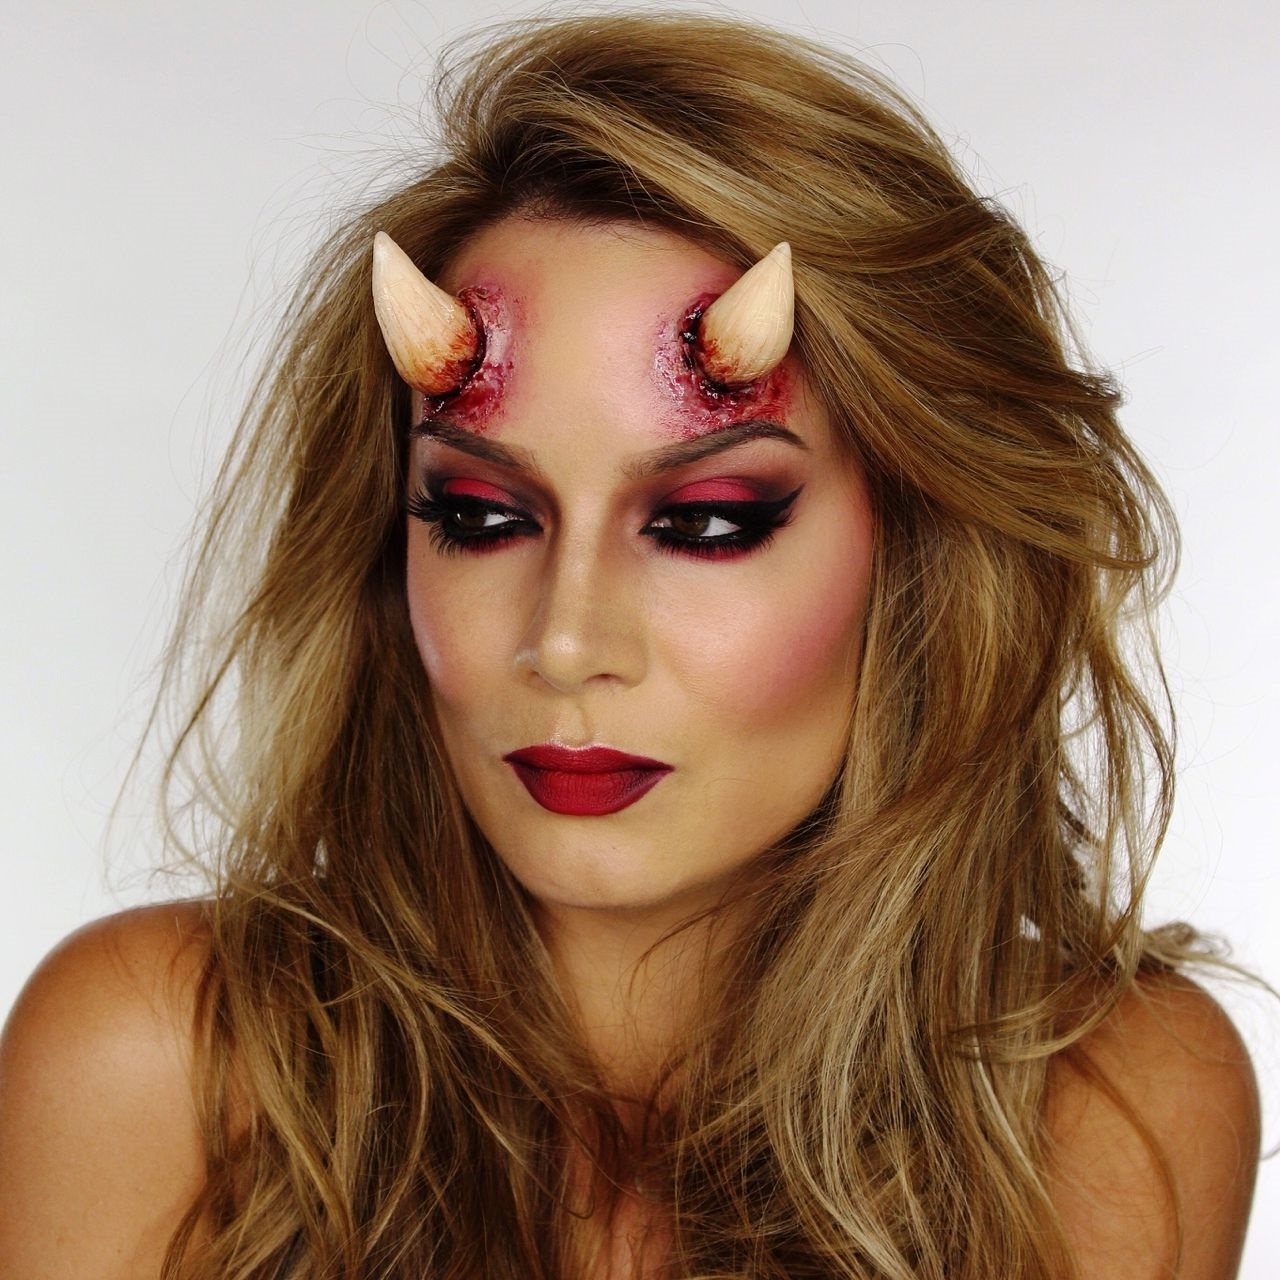 Maquillage d'Halloween superbe.